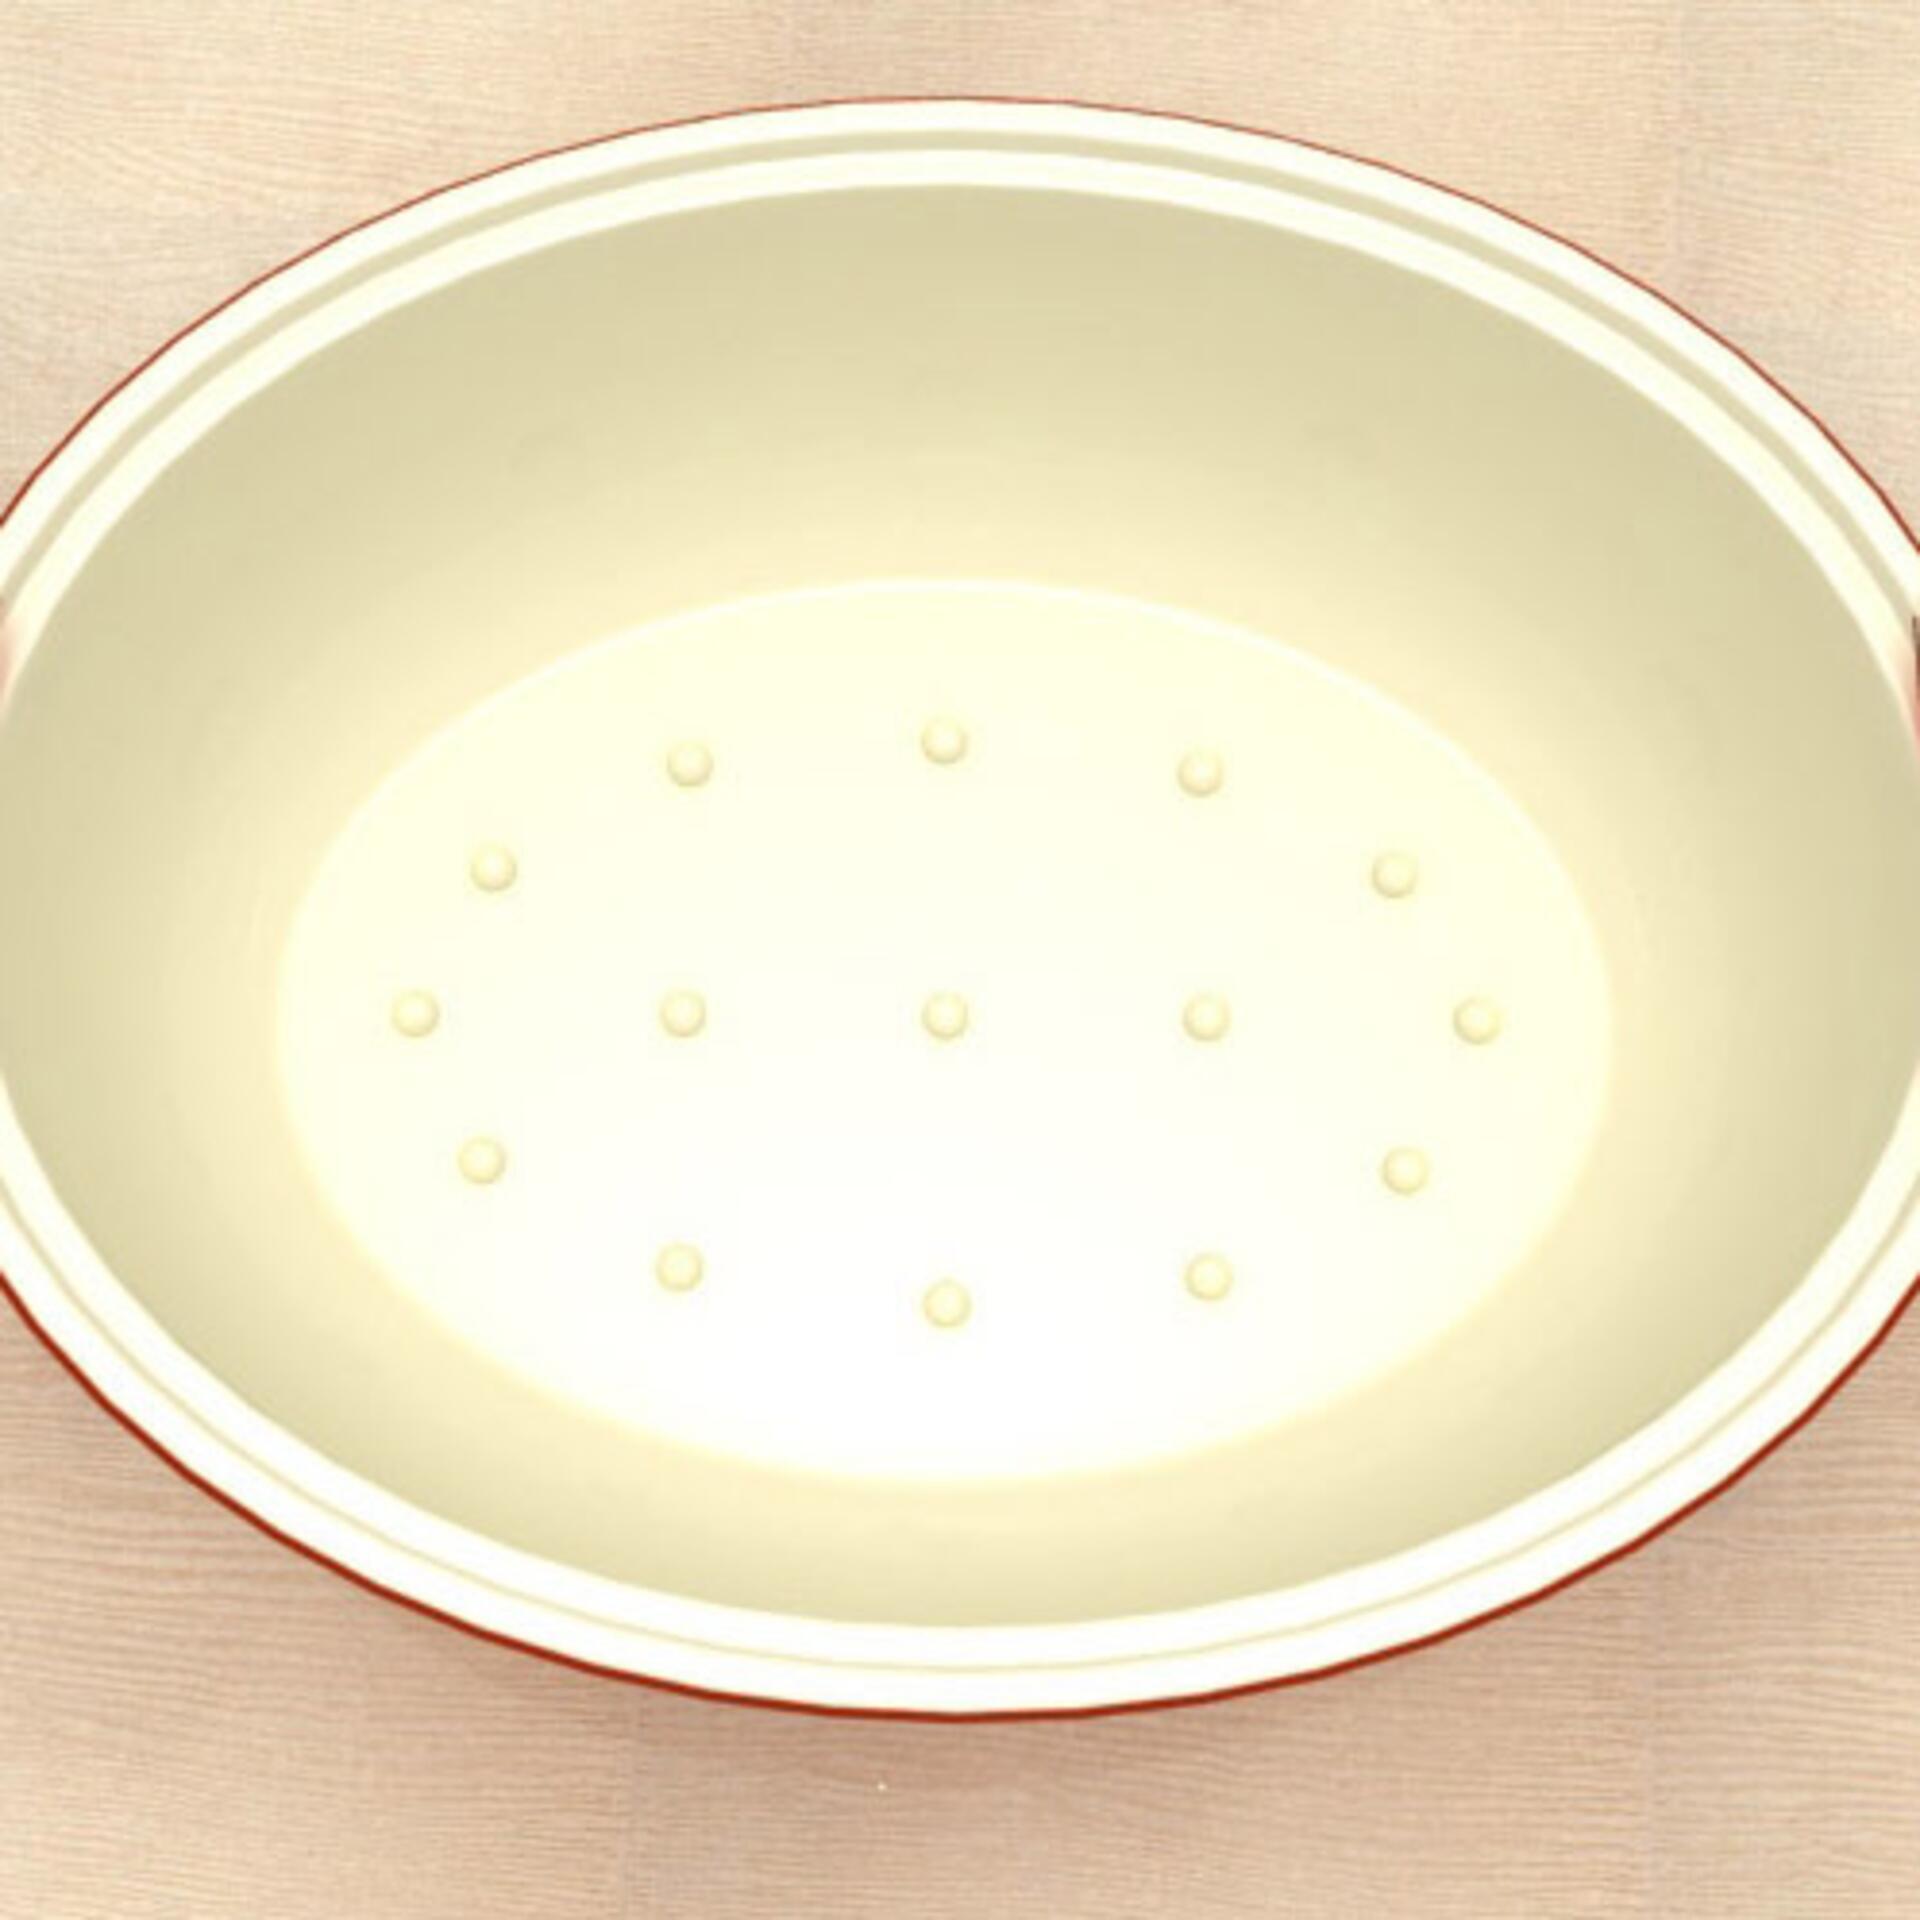 Le Creuset Bratform Tradition oval mit Deckel Ofenrot